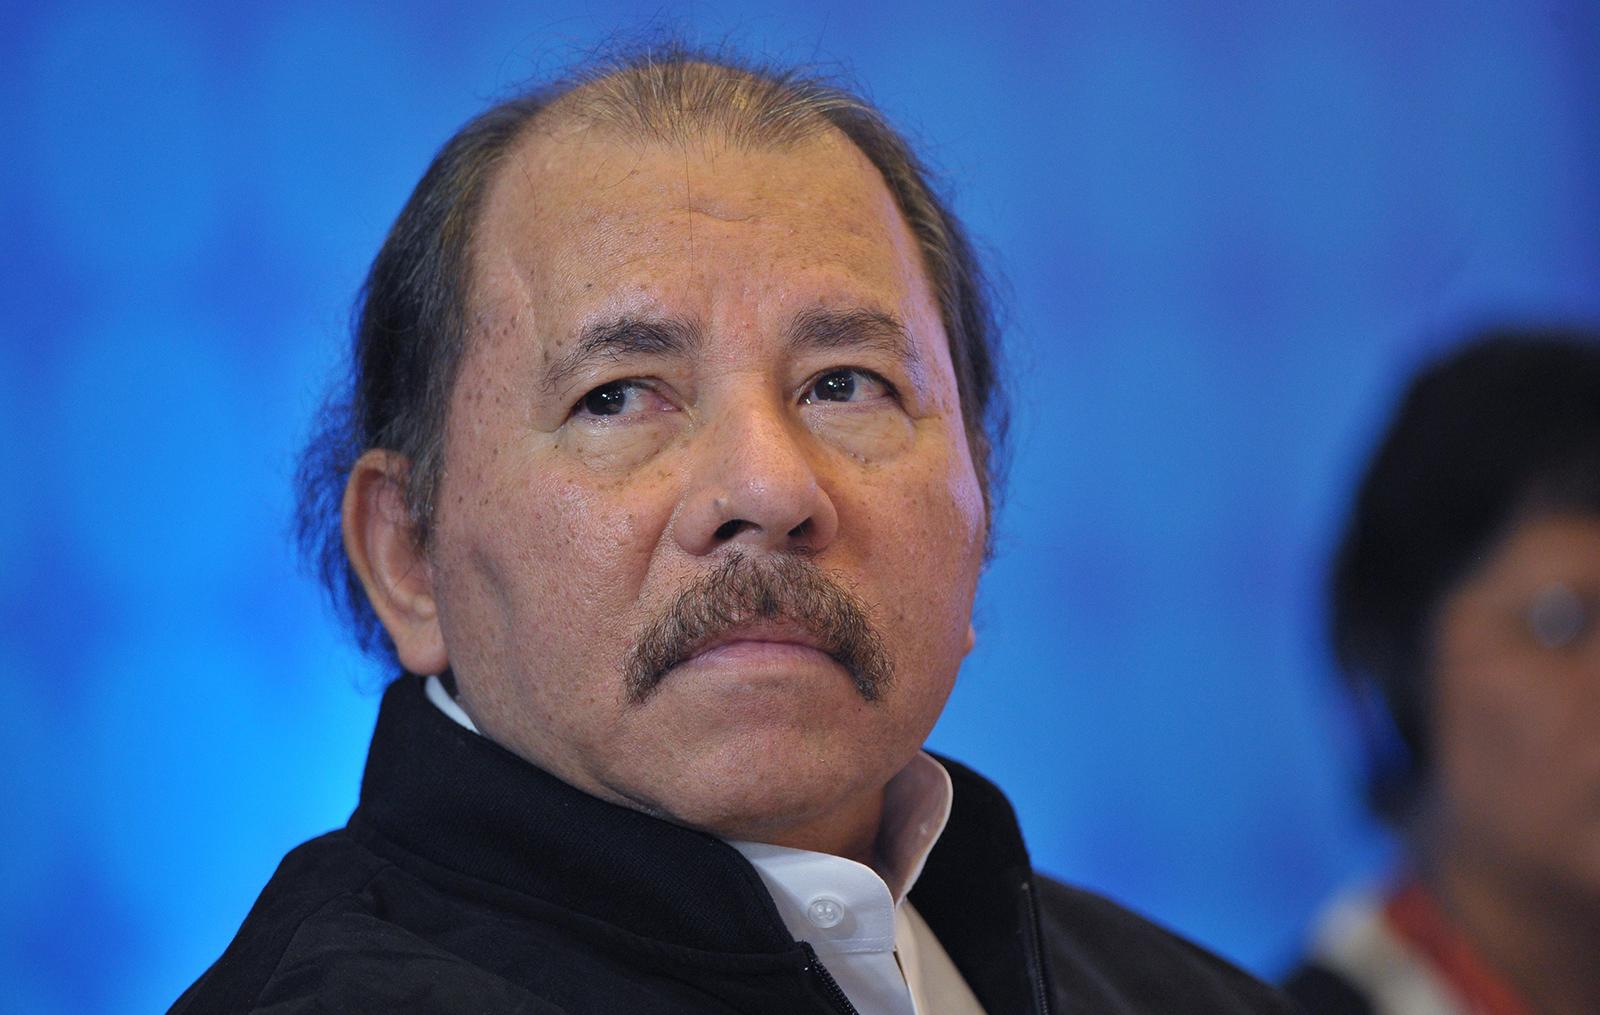 Nicaraguan President Daniel Ortega attends a meeting in Panama City on April 10, 2015.